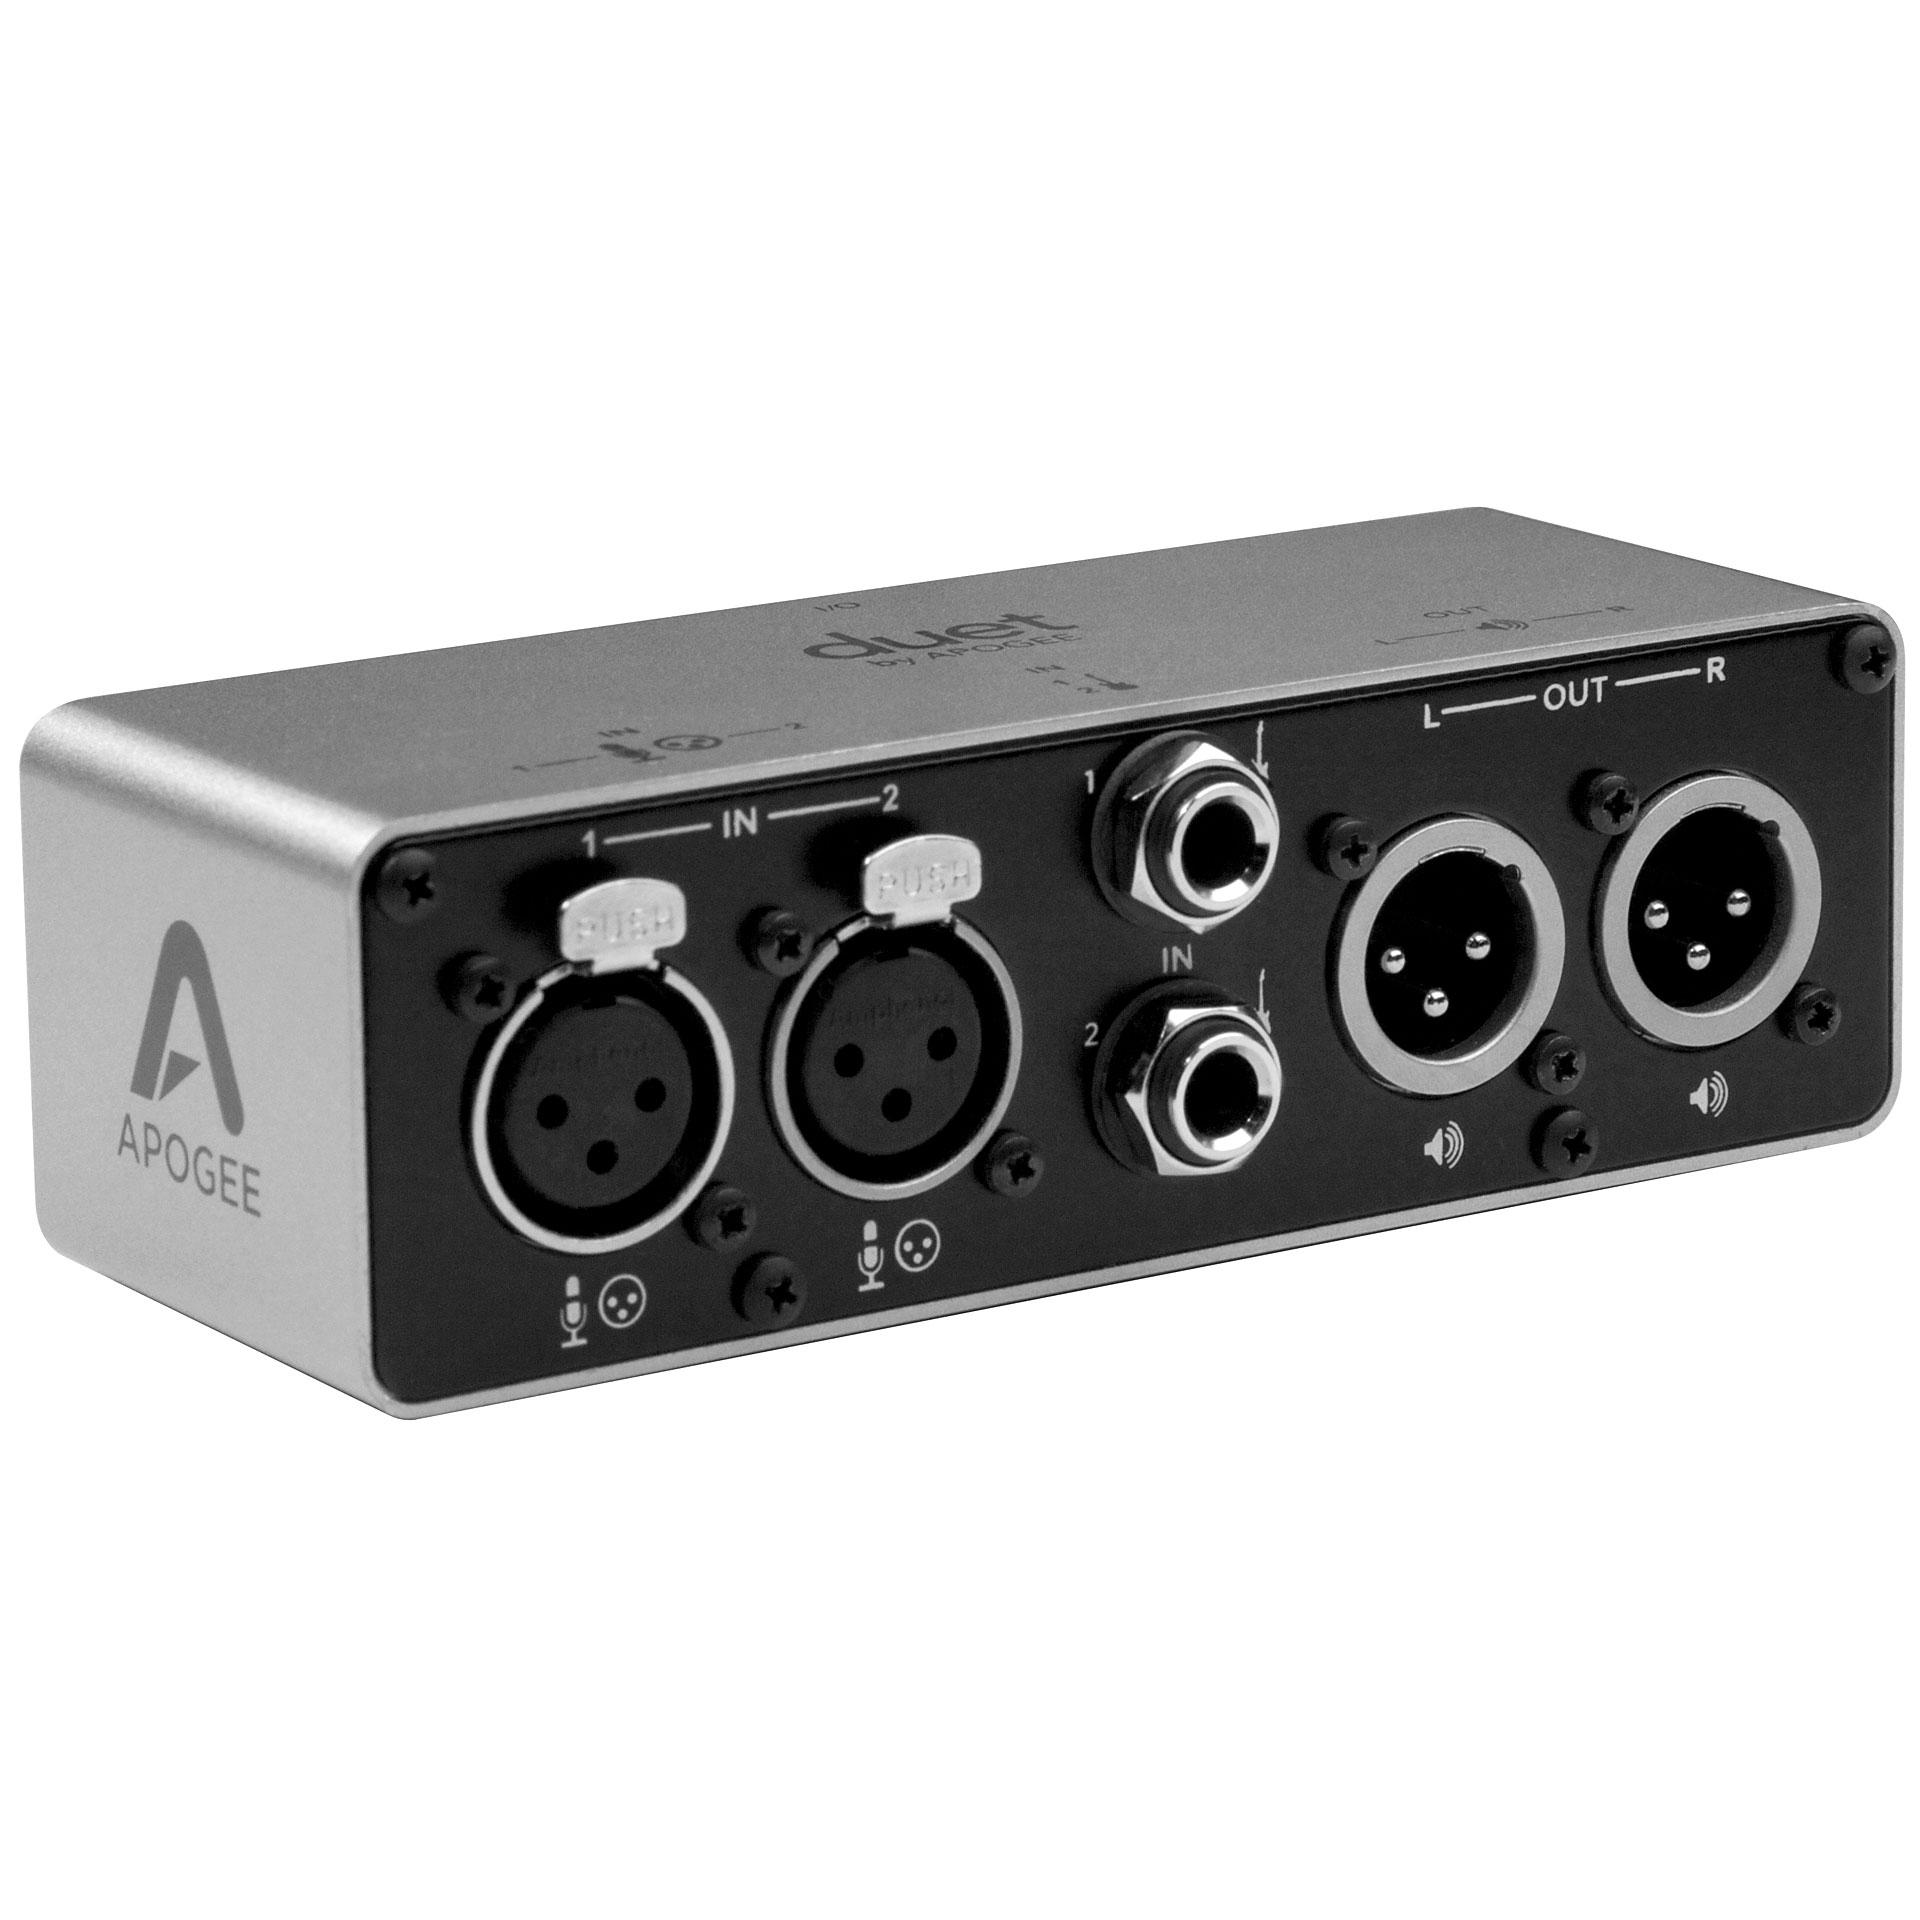 apogee duet 2 breakout box audio interface. Black Bedroom Furniture Sets. Home Design Ideas